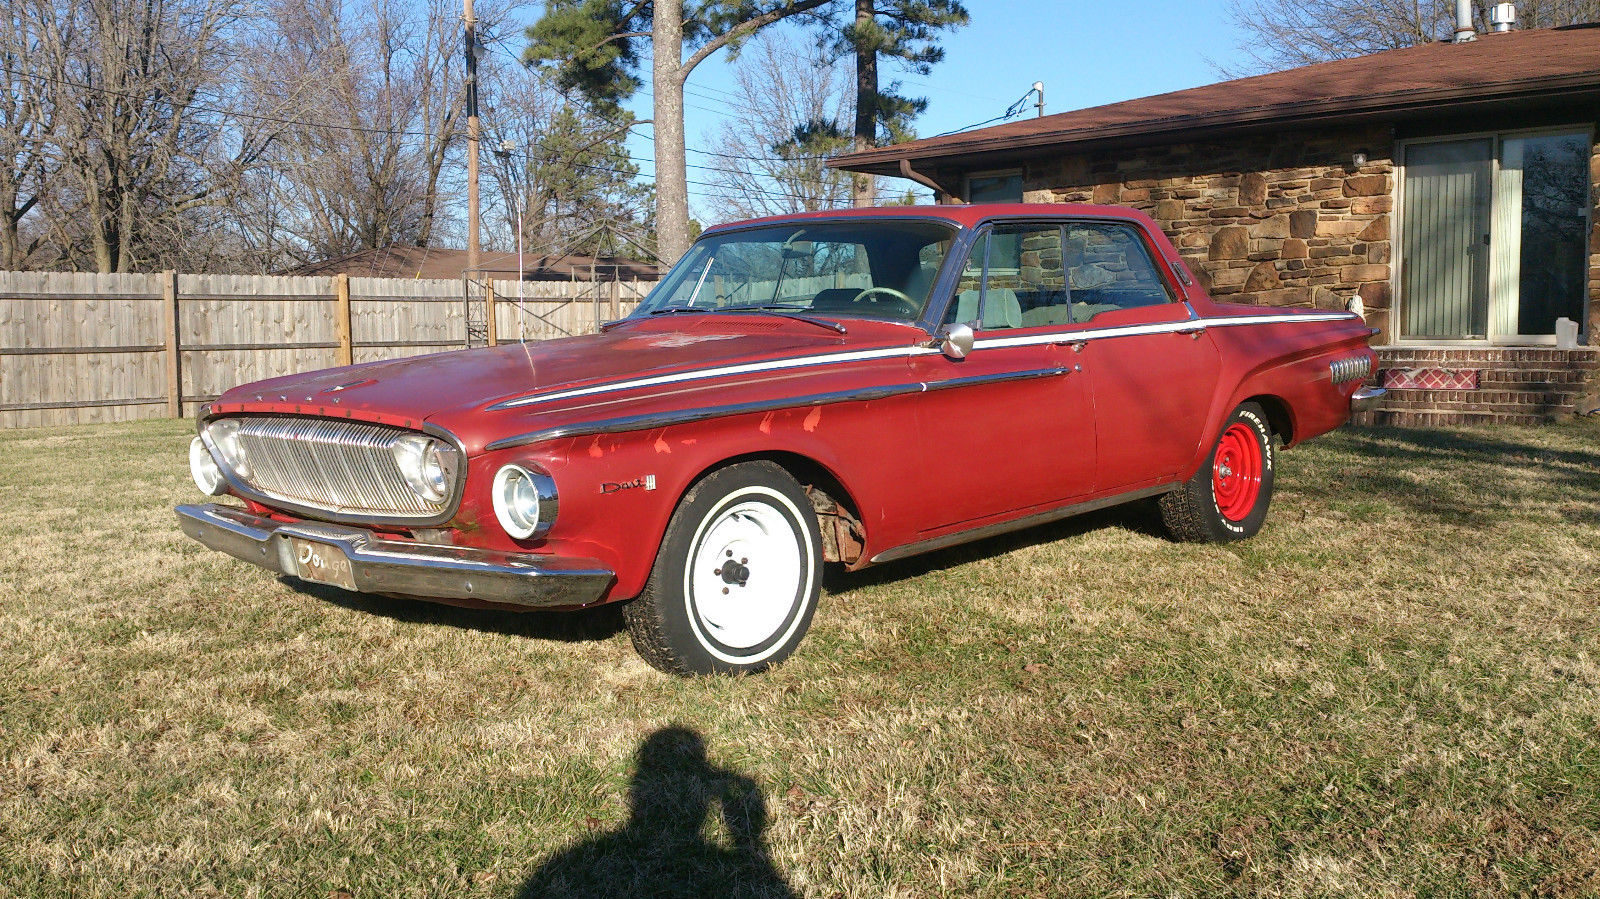 1962 Dodge Dart 440 V8 Push Button Auto 8 3 4 Rear Mopar Classic Dodge Dart 1962 For Sale